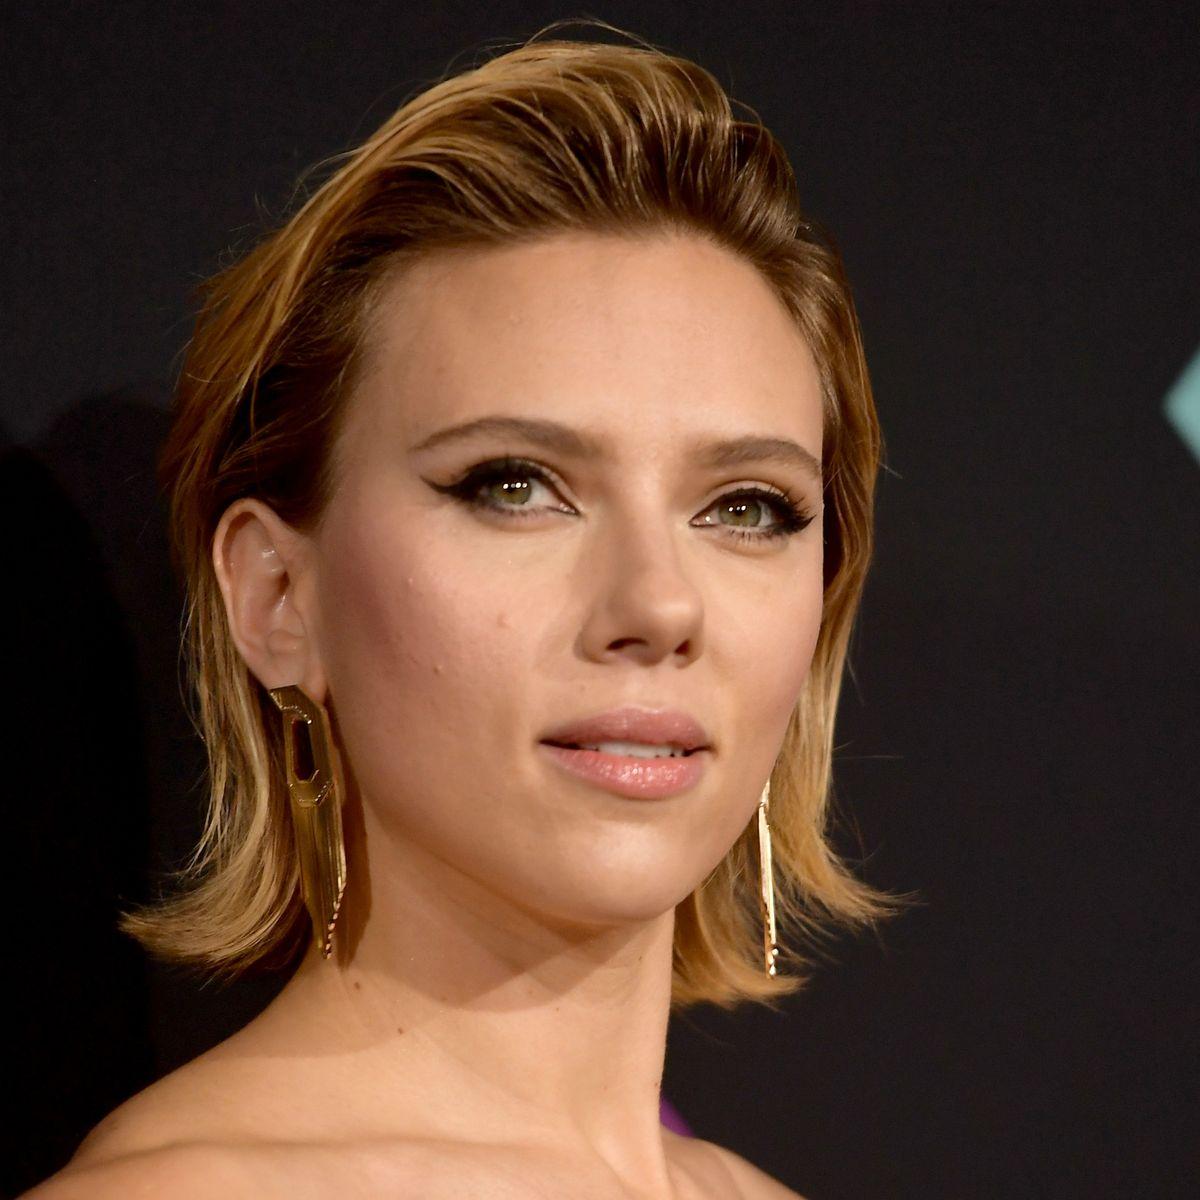 Scarlett Johansson Ruminates On Deepfake Porn Of Her Image